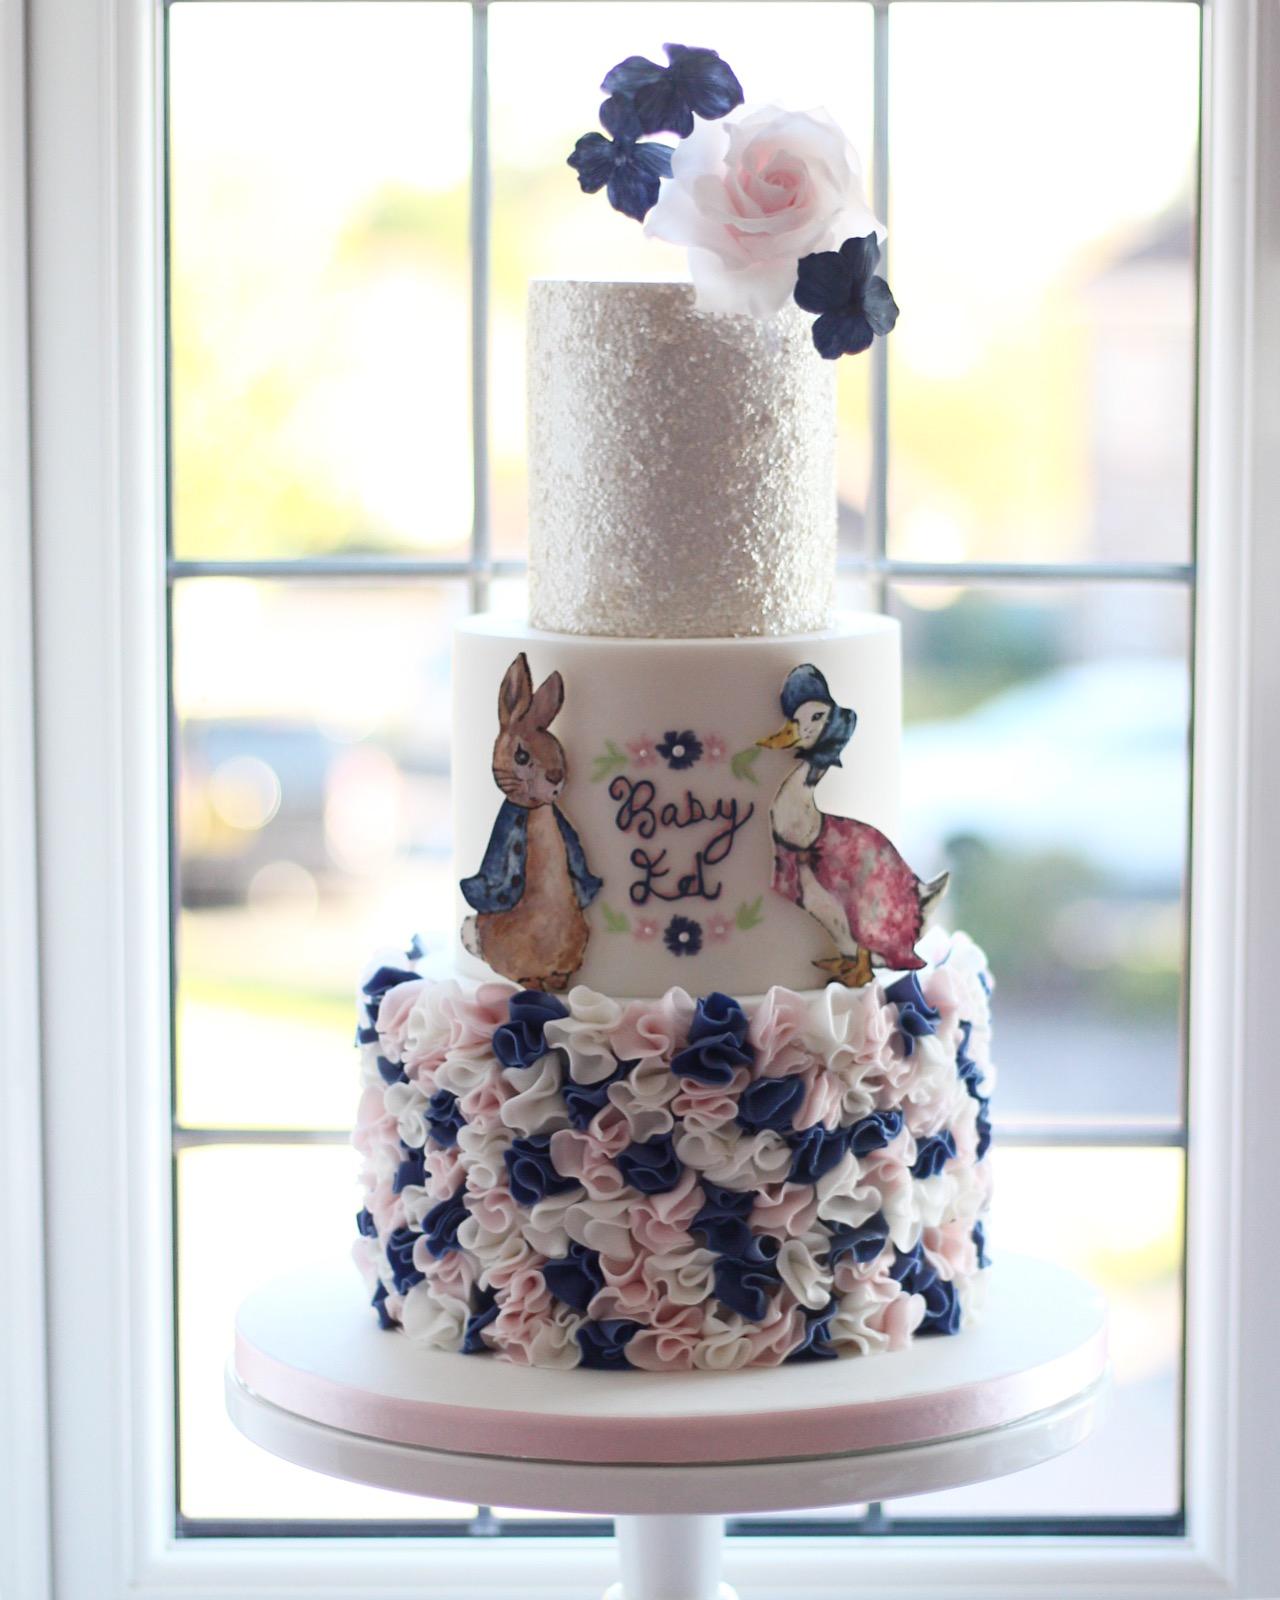 Peter Rabbit & Jemima Puddle Duck Baby Shower Cake